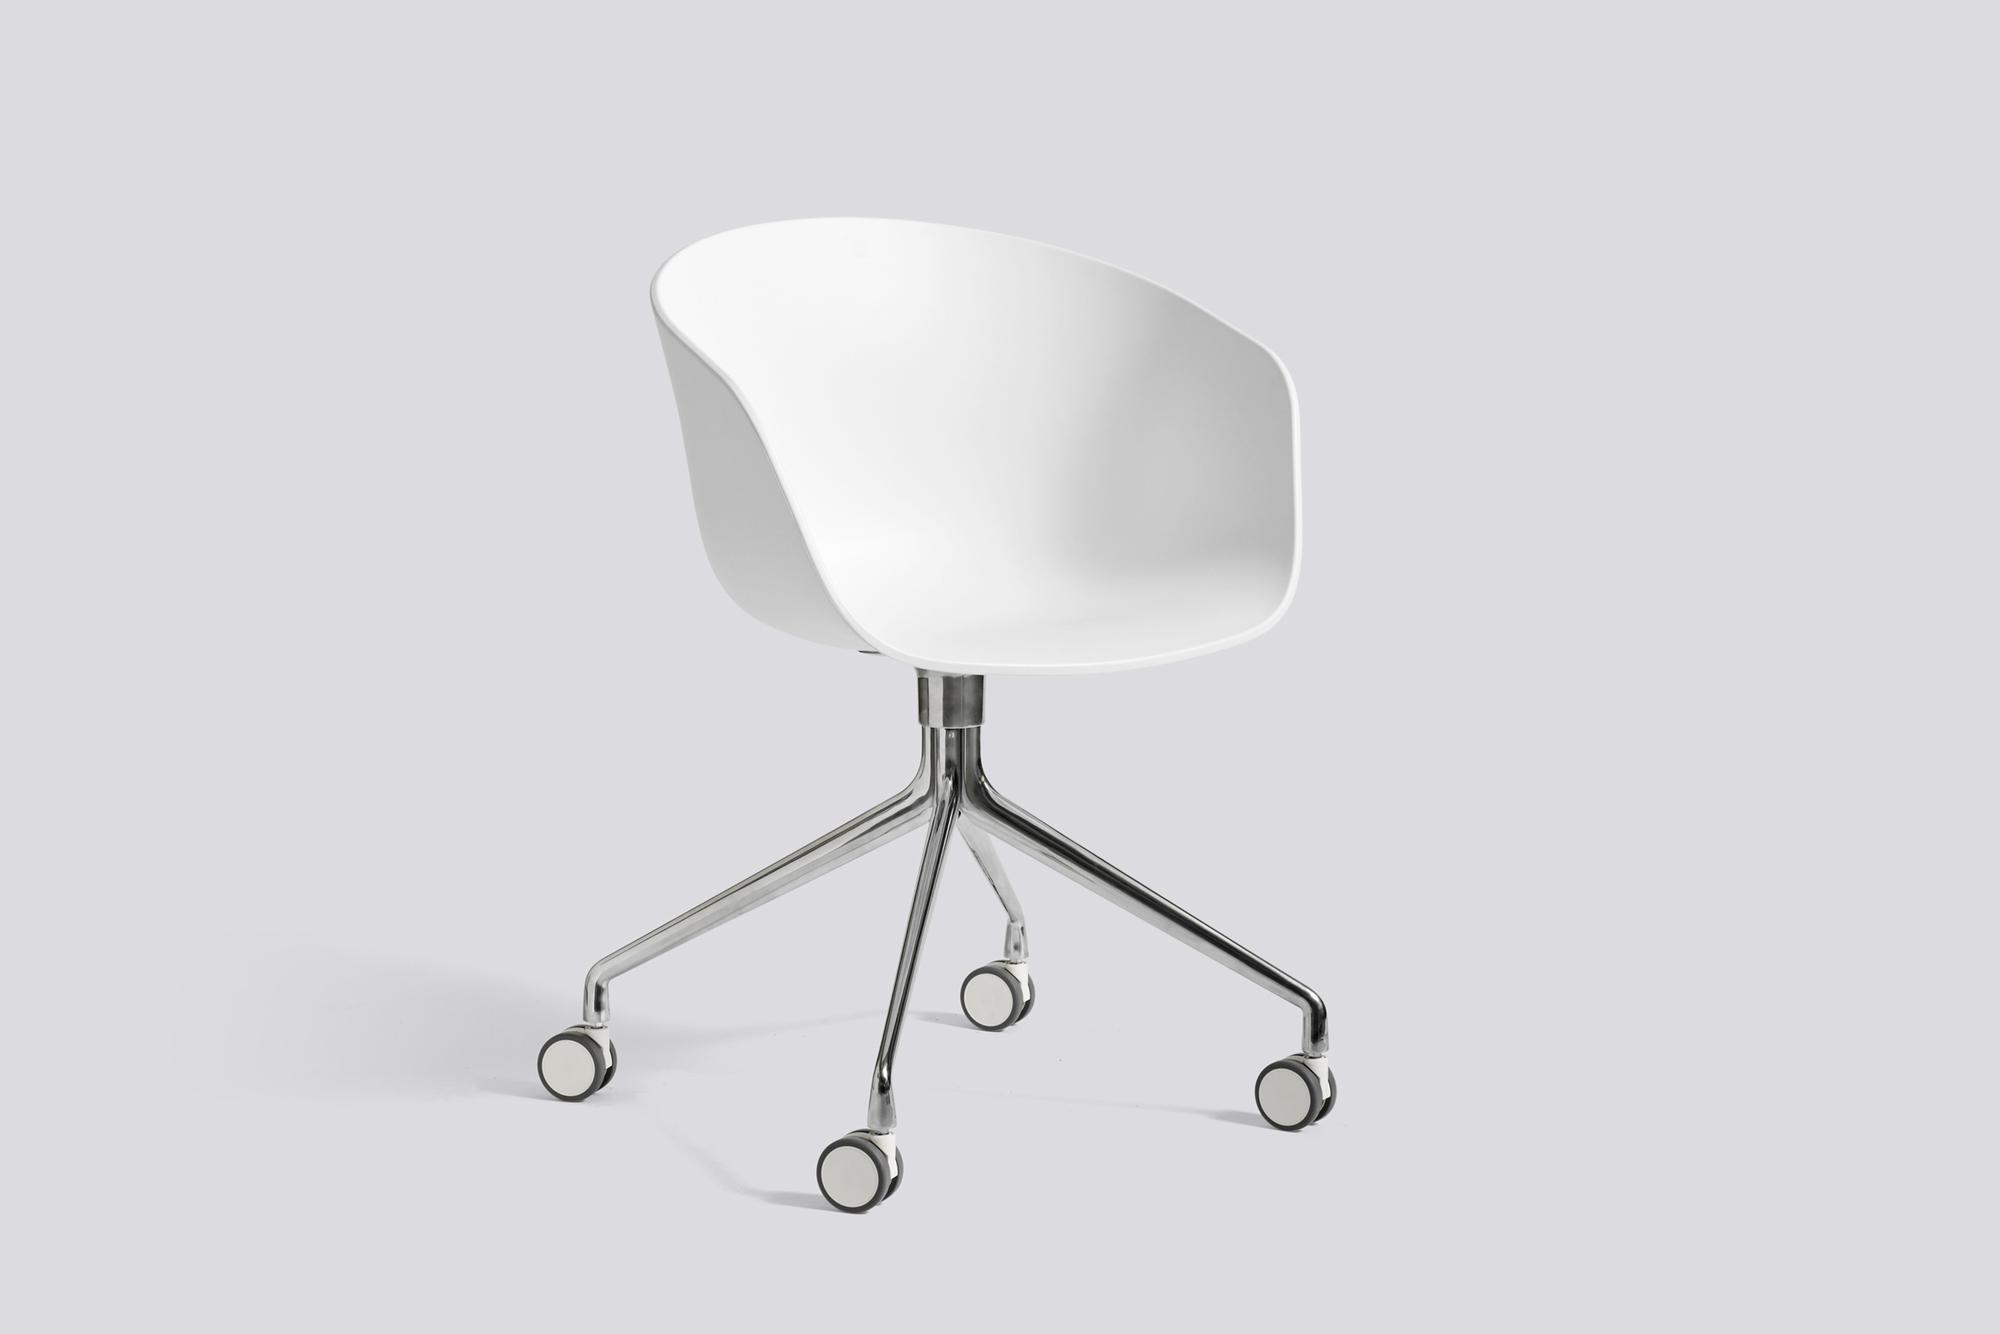 About A Chair AAC24 AAC 24 Chaise Noir Aluminium poli Hay   blanc   Aluminium poli   HAY AAC24 Weiss ALU POLIERT